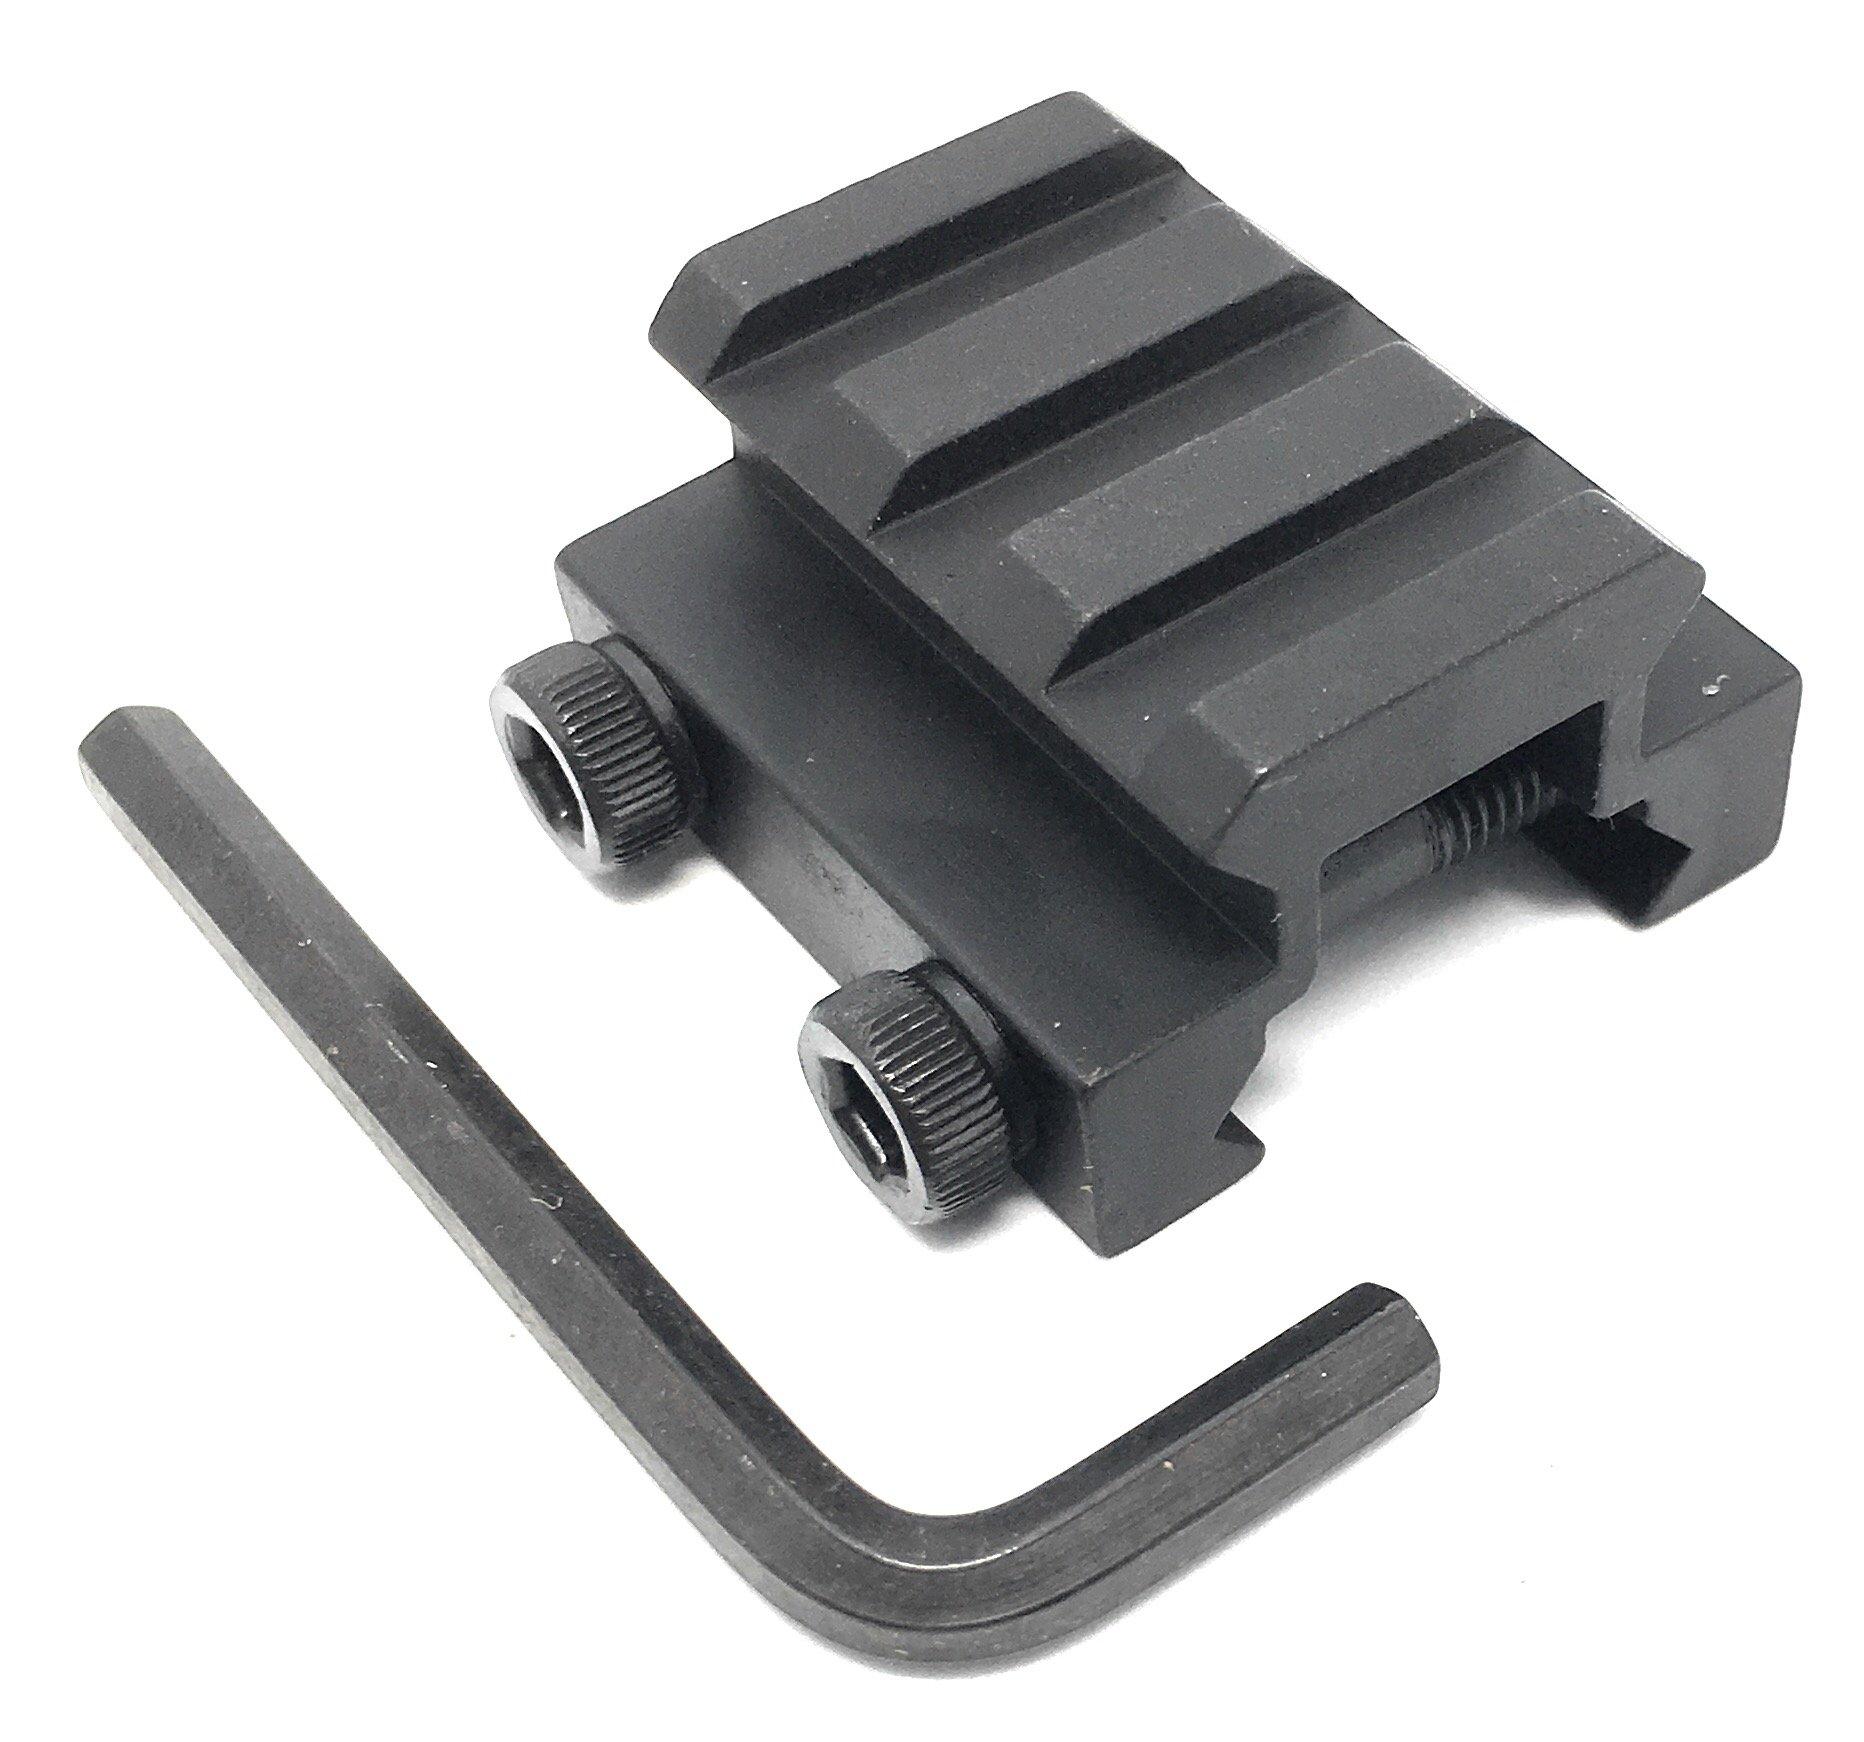 Dagger Defense single picatinny rail riser, 3x slots with hex screw mounting